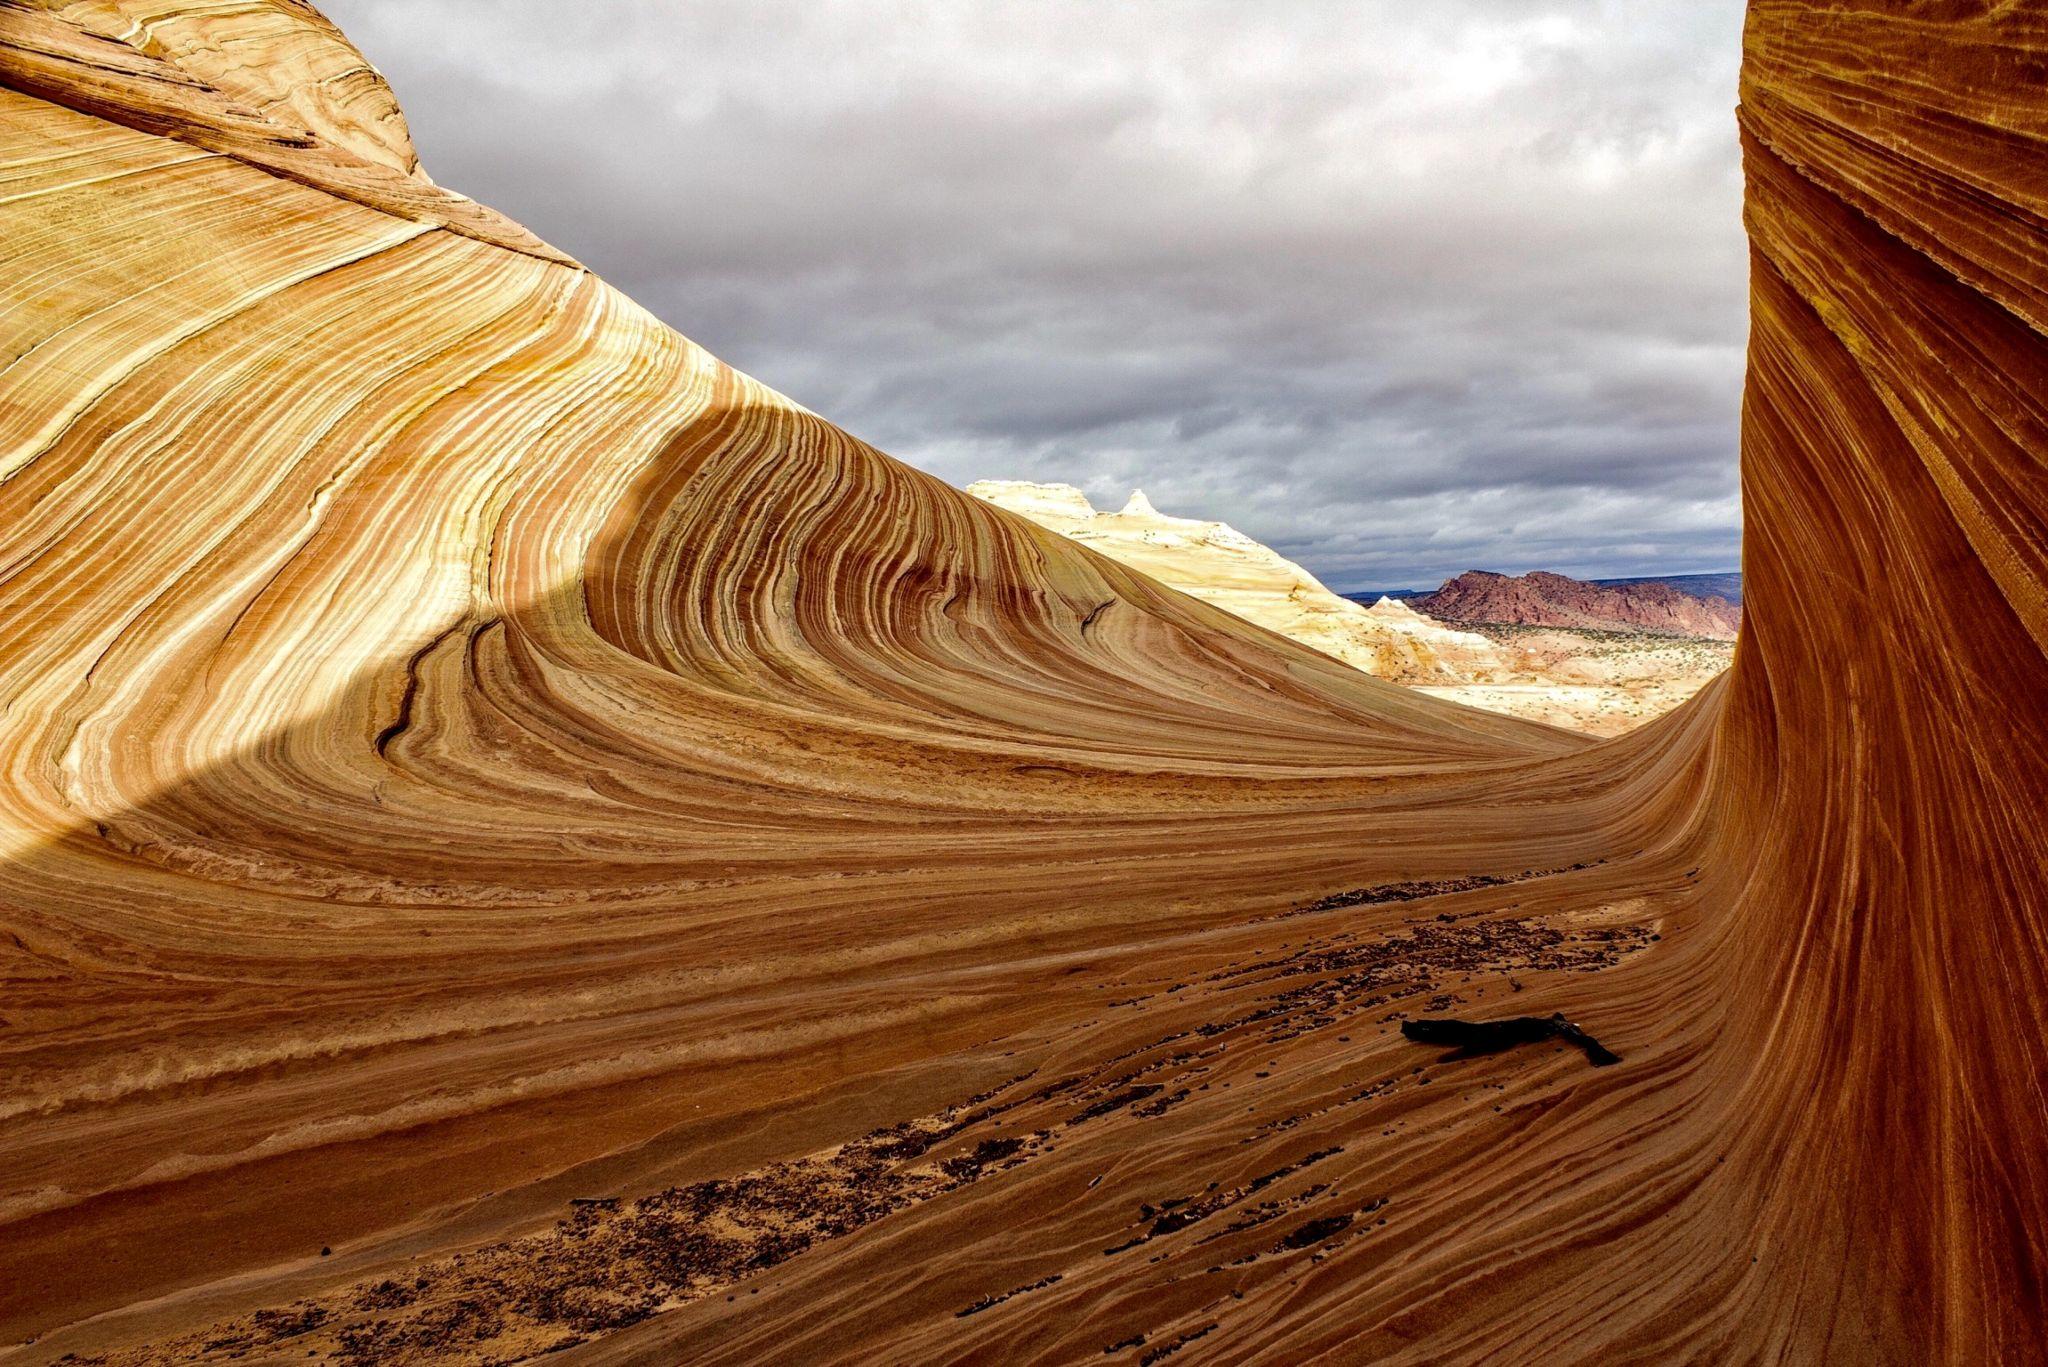 The Wave, USA